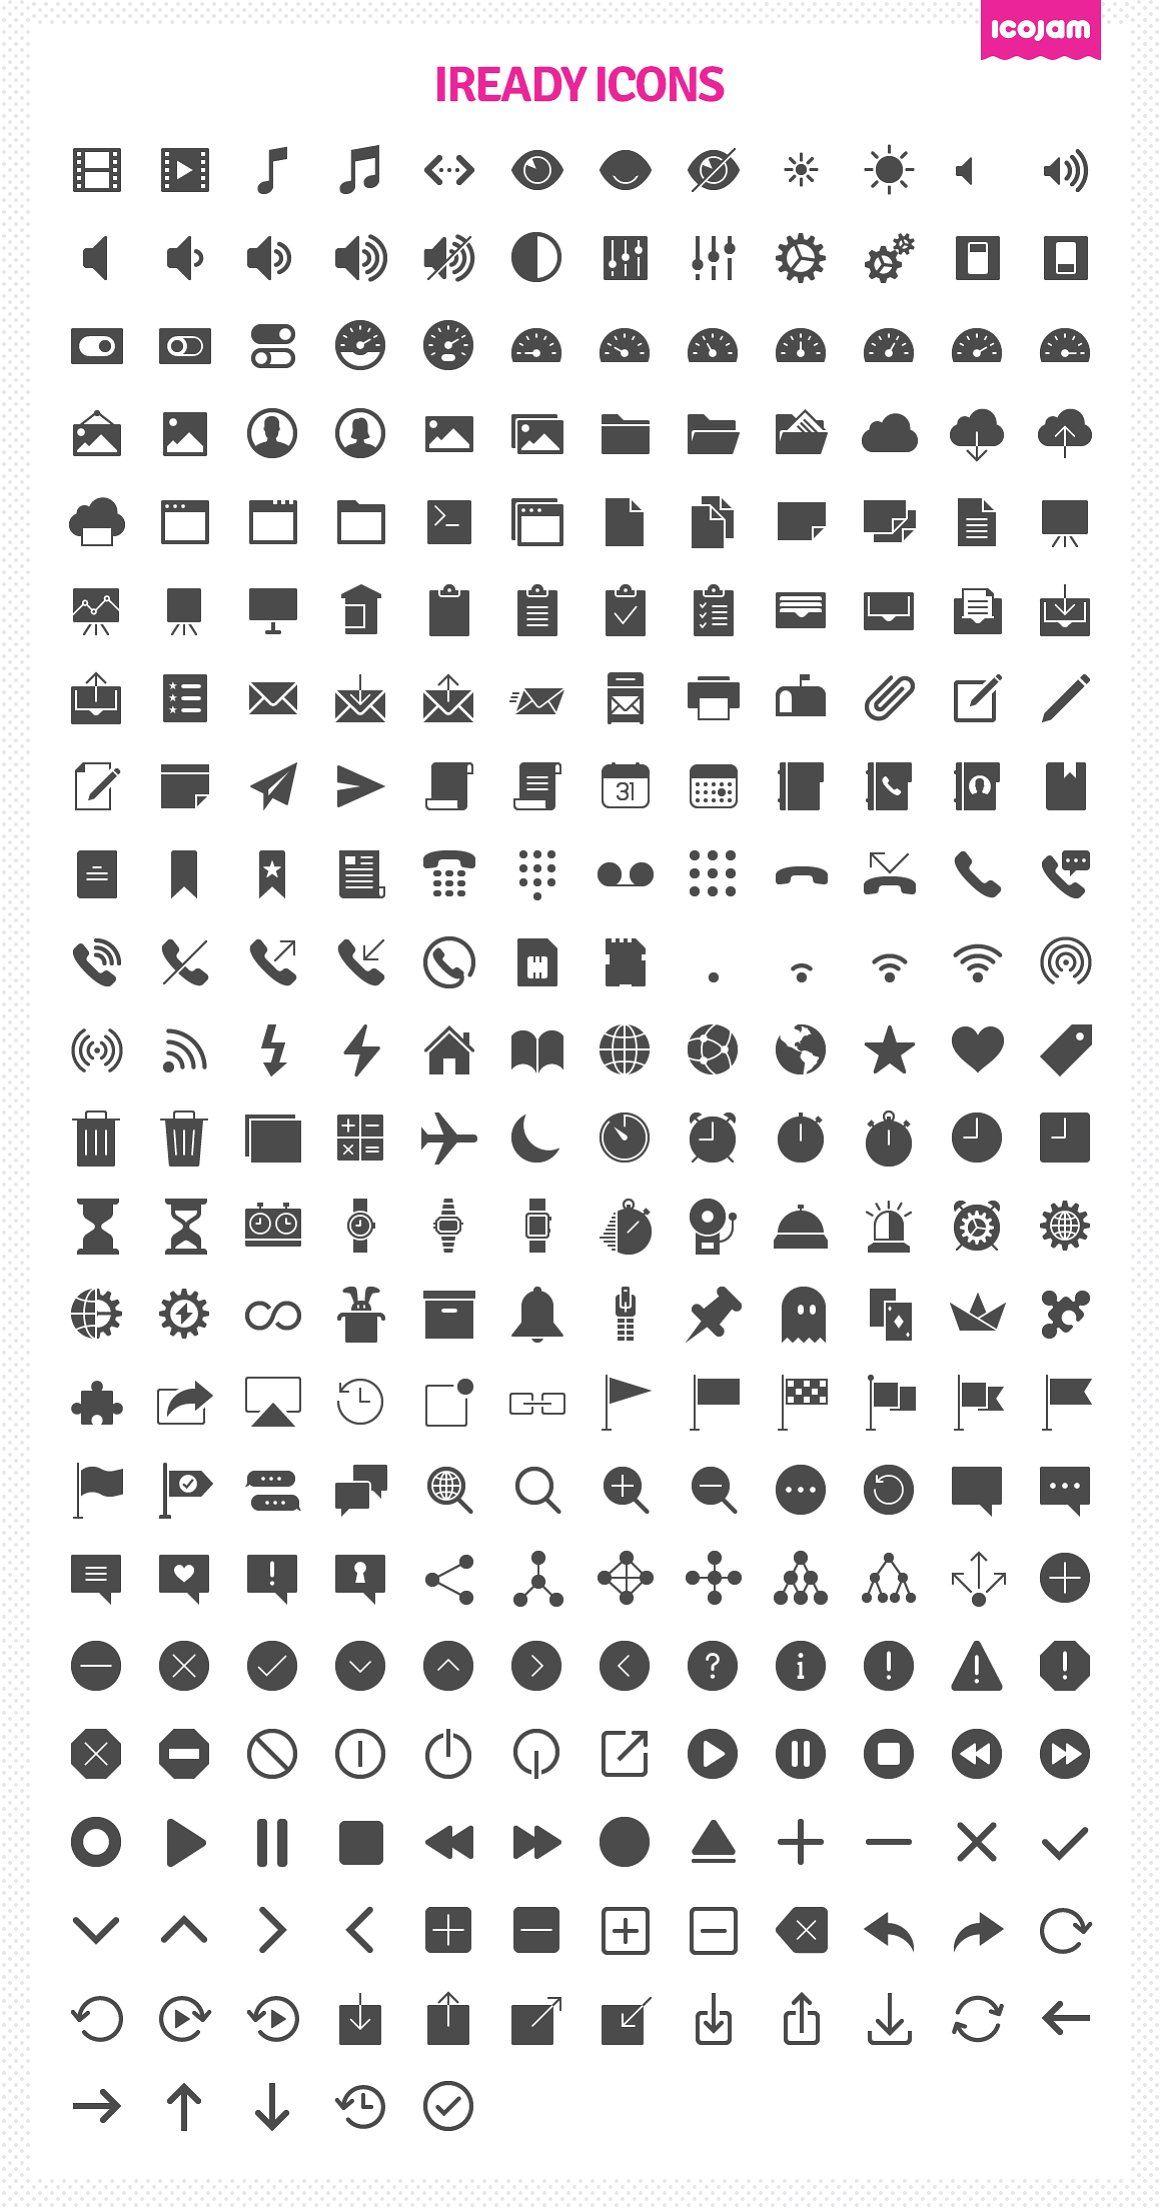 269 iReady icons in 2020 Icon, Ios icon, Icon design